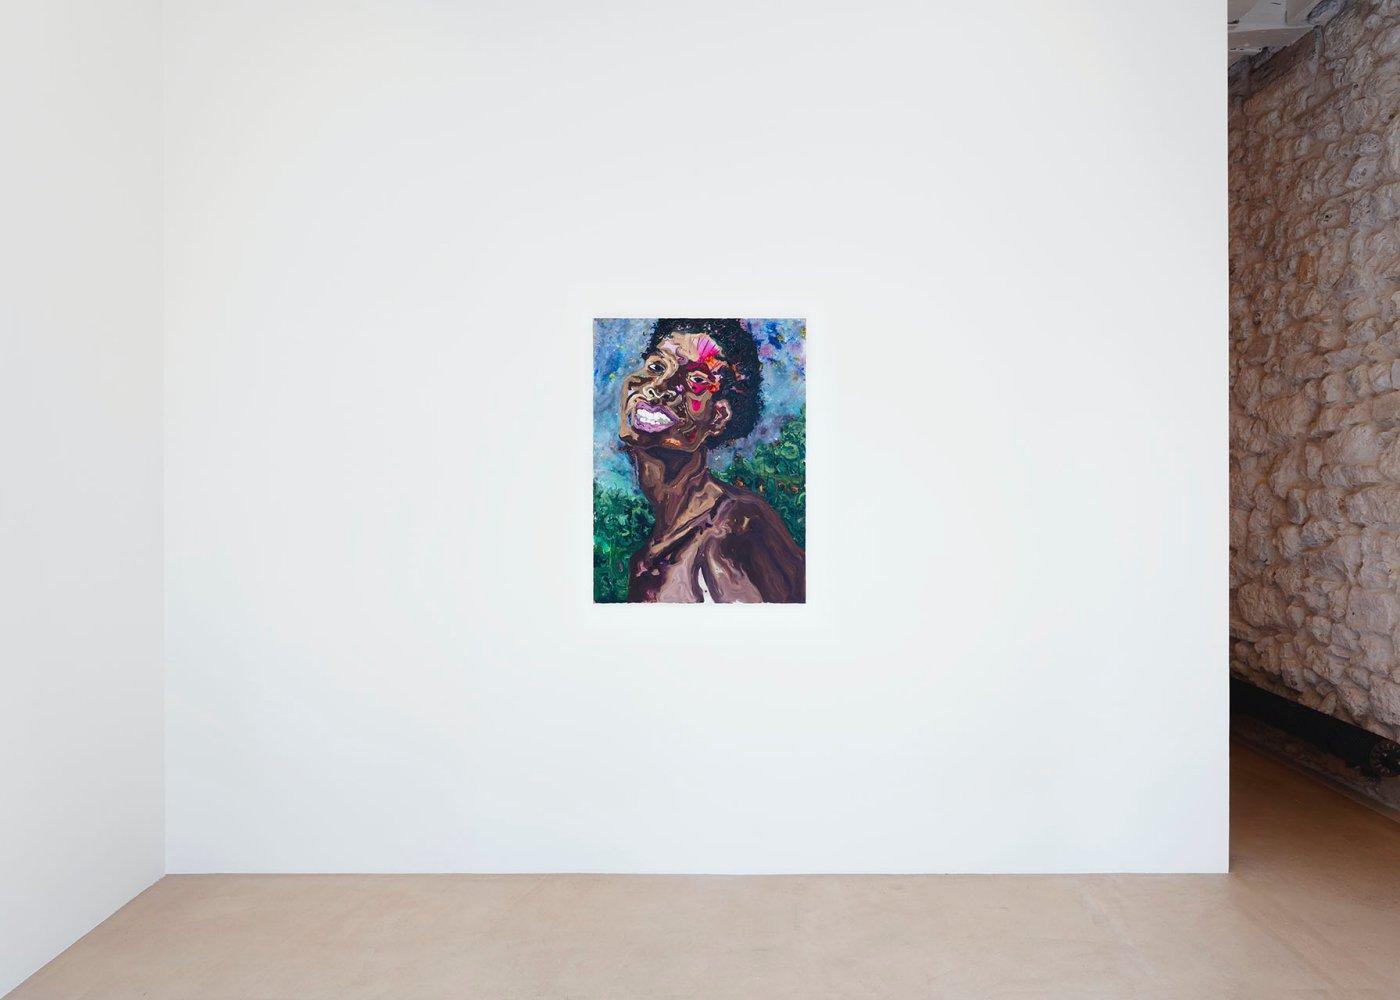 Massimo de Carlo Piece Unique Portraiture One Century Apart 2